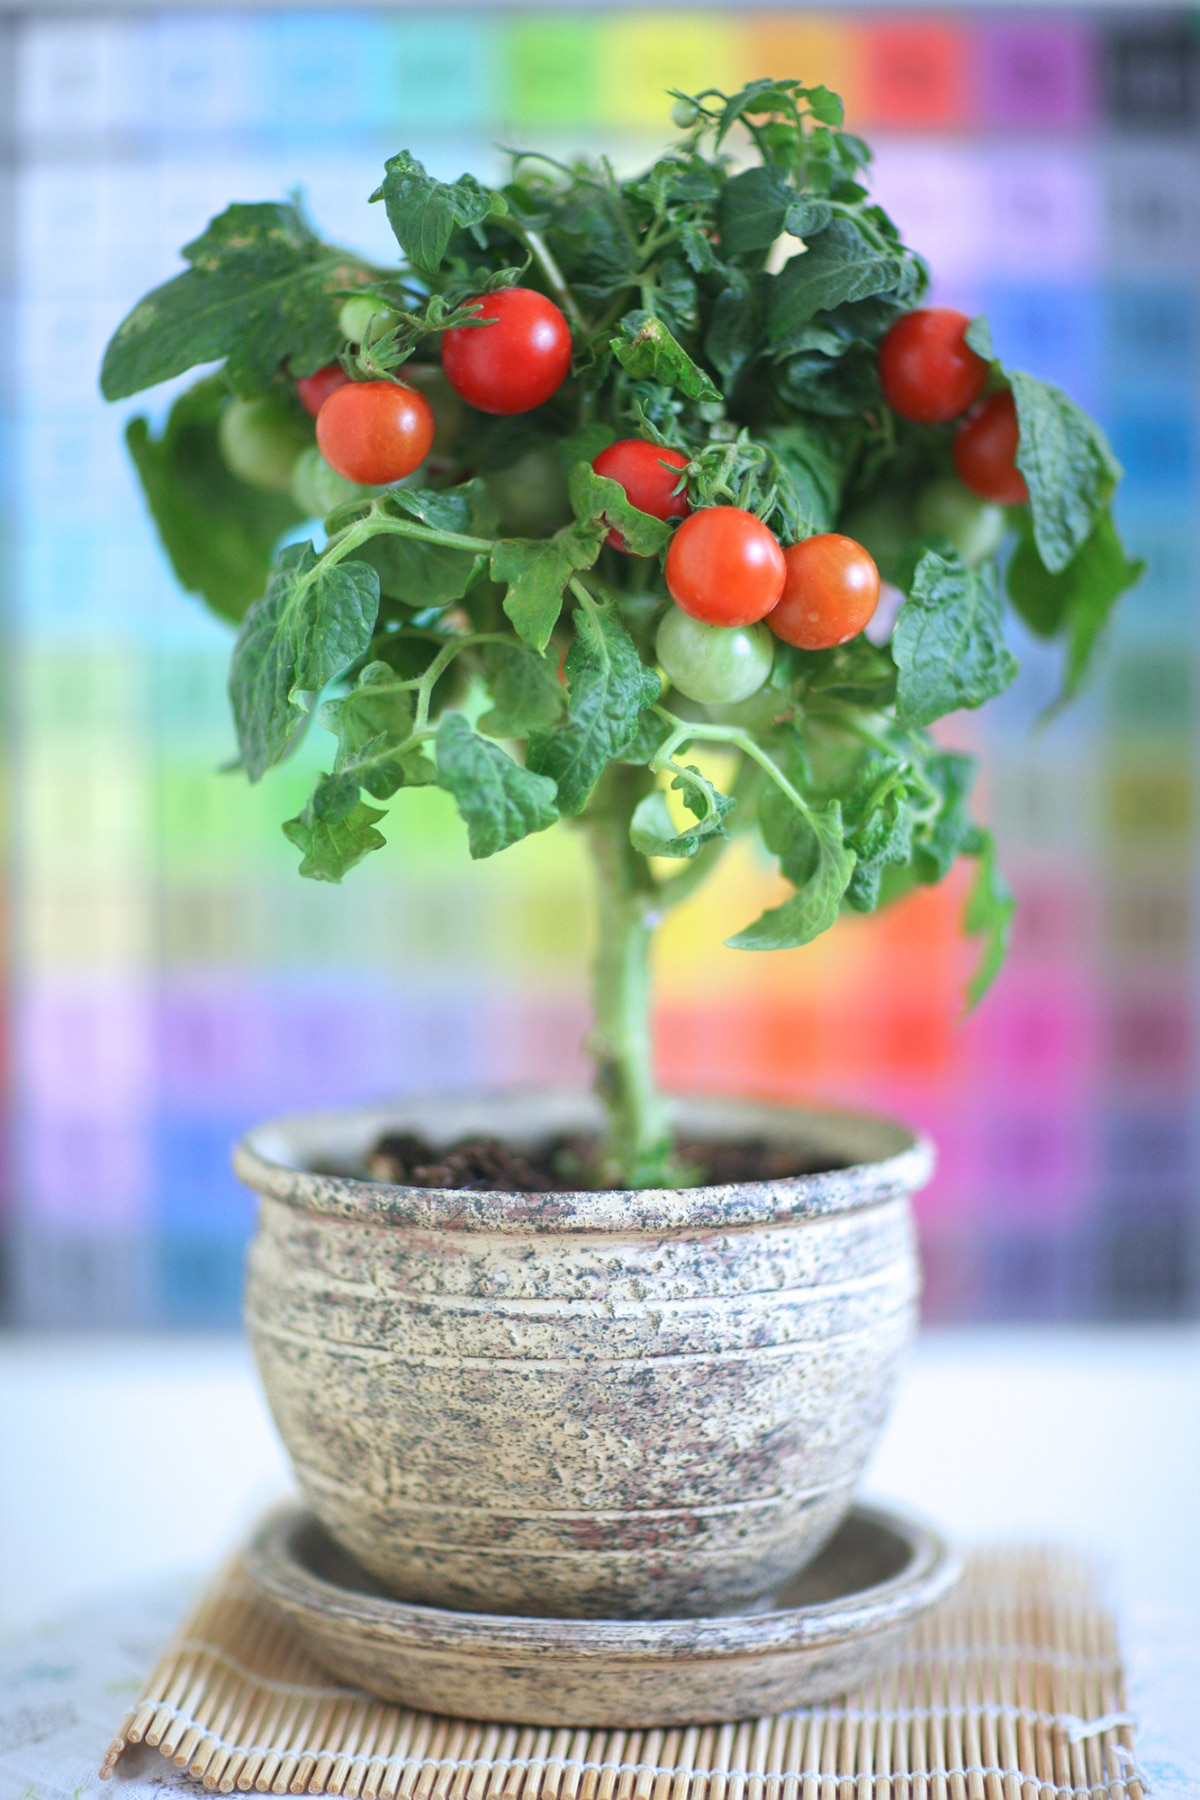 Bushy Tomato